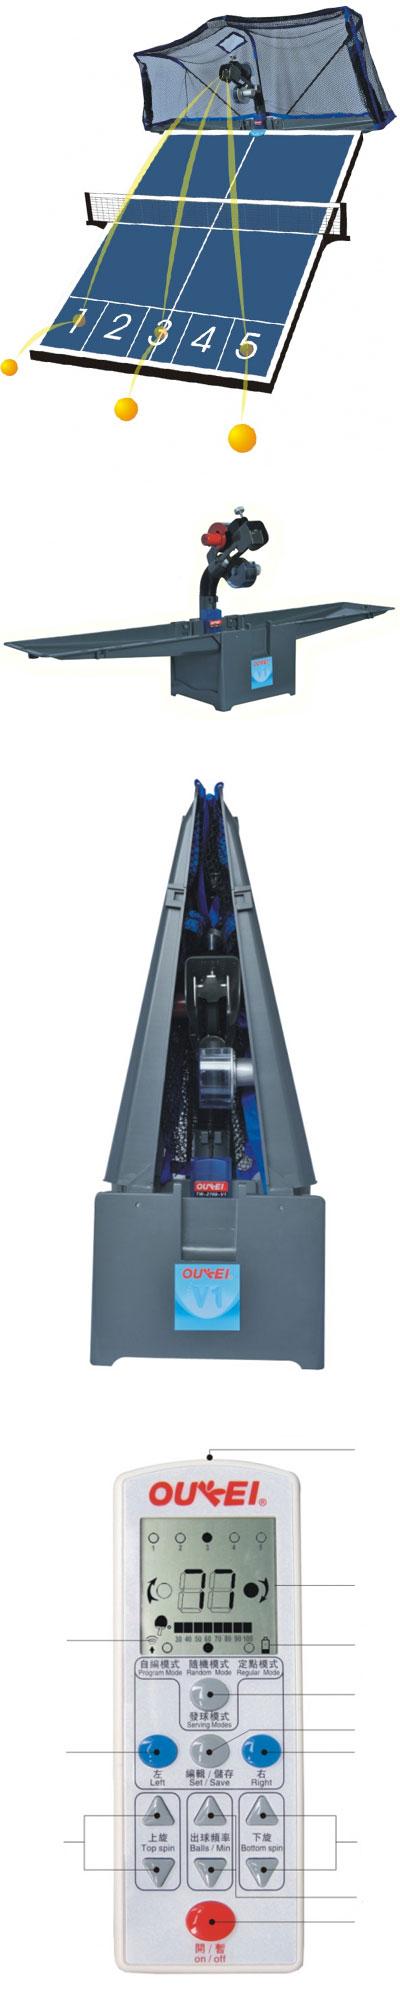 Máy bắn bóng bàn Oukei TW-2700-V1